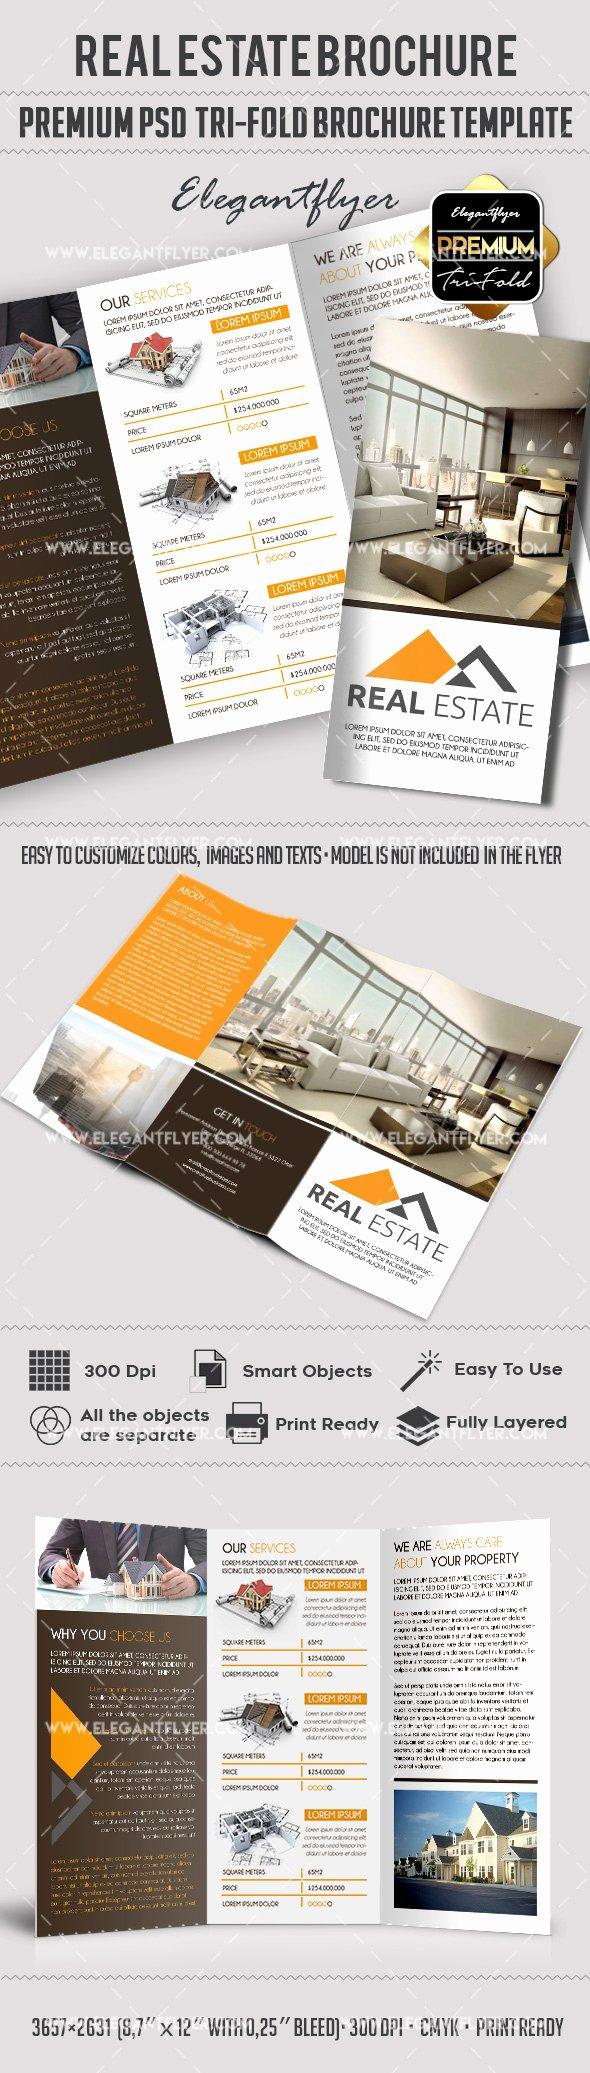 Real Estate Flyer Template Psd Luxury Psd Brochure for Mercial Real Estate – by Elegantflyer